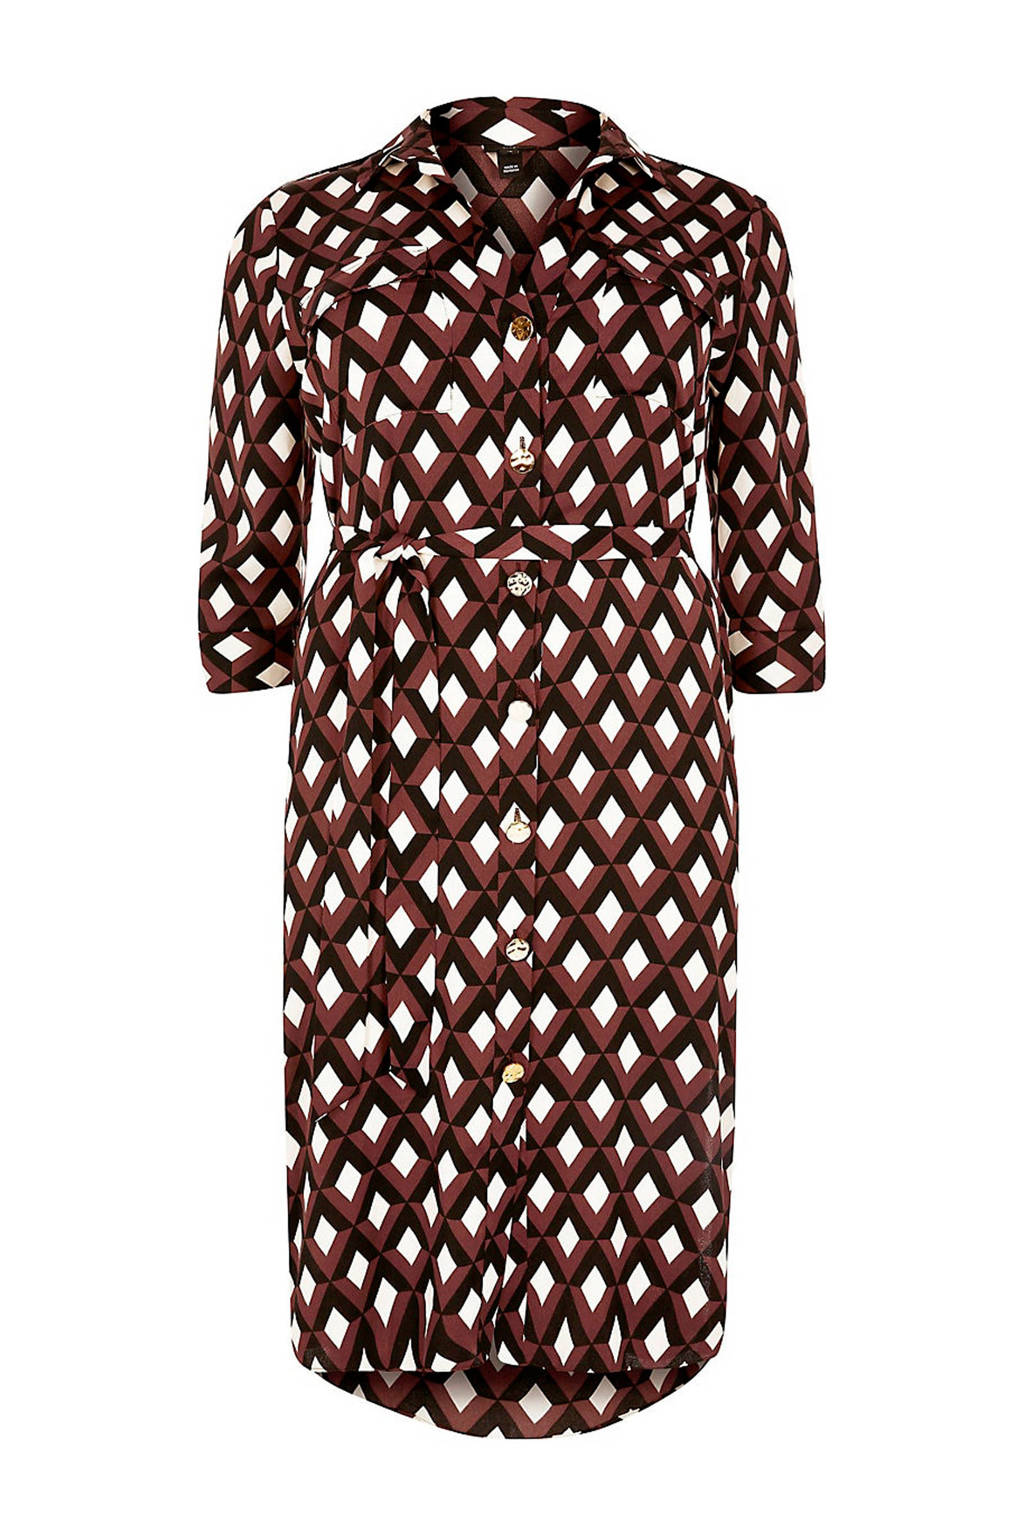 River Island Plus blousejurk met grafische print bruin, Bruin